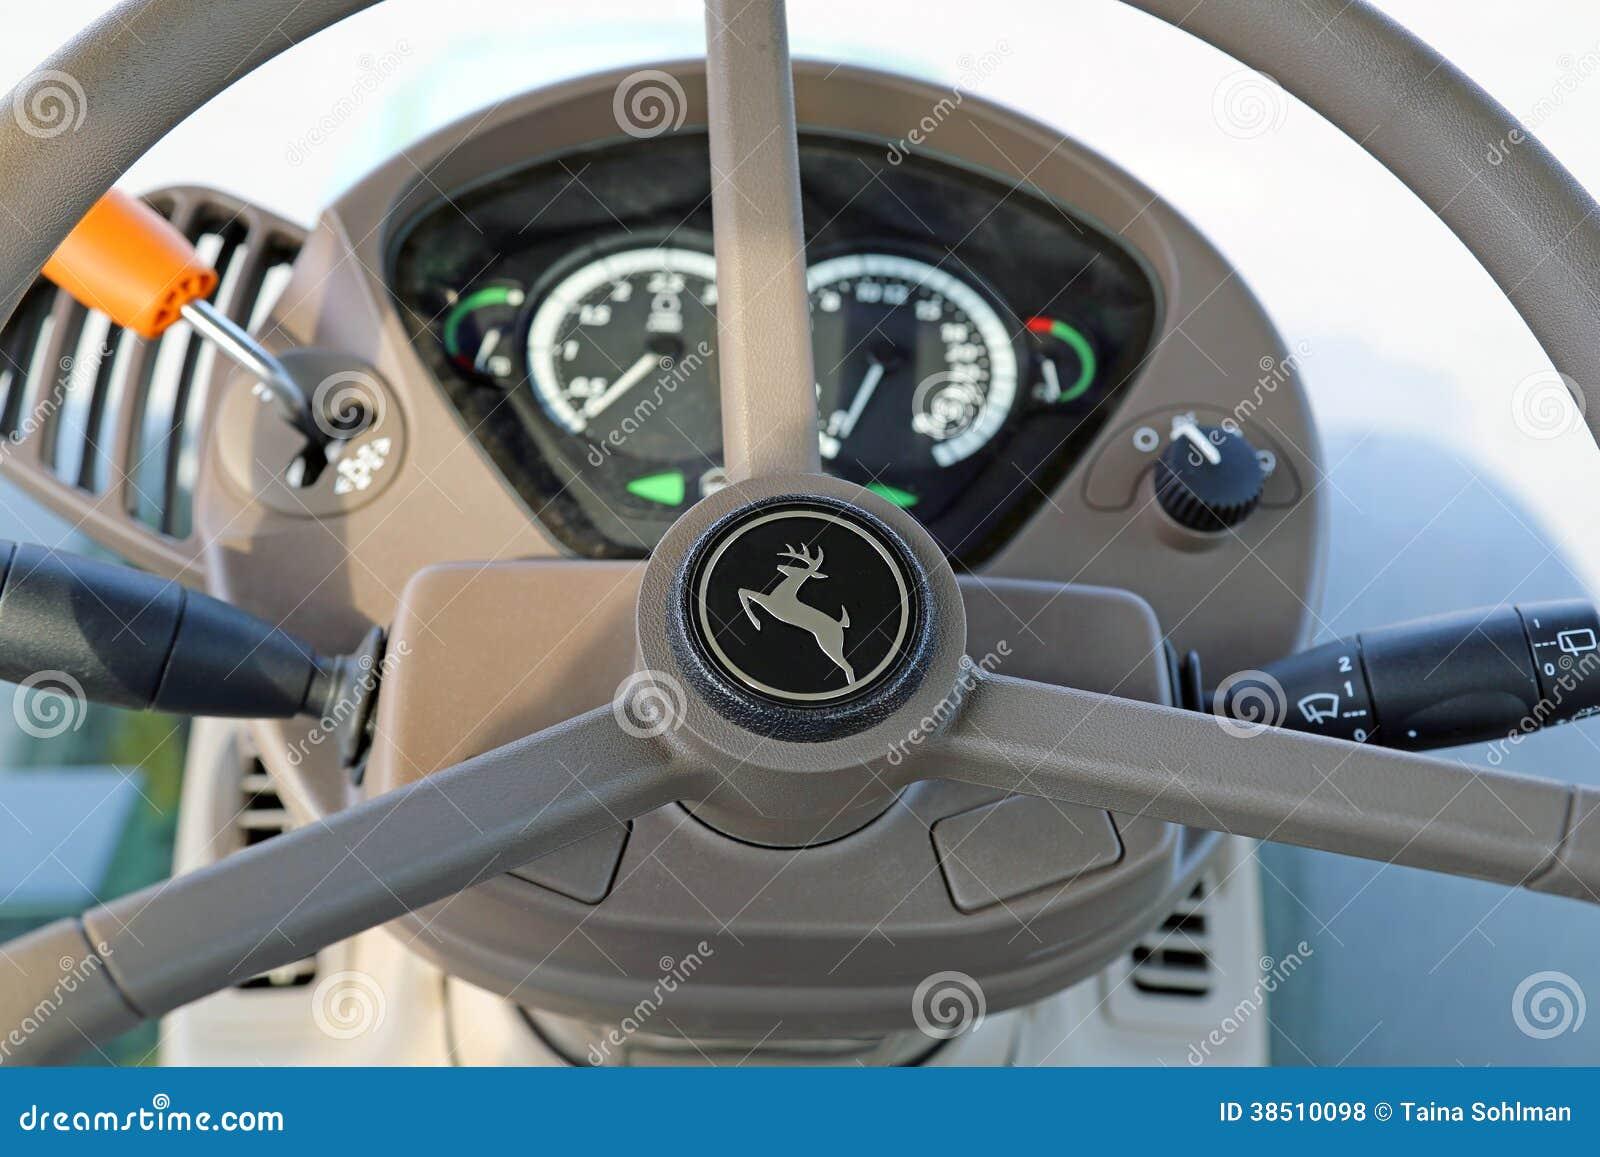 Tractor Steering Wheel Console : Steering wheel of john deere agricultural tractor